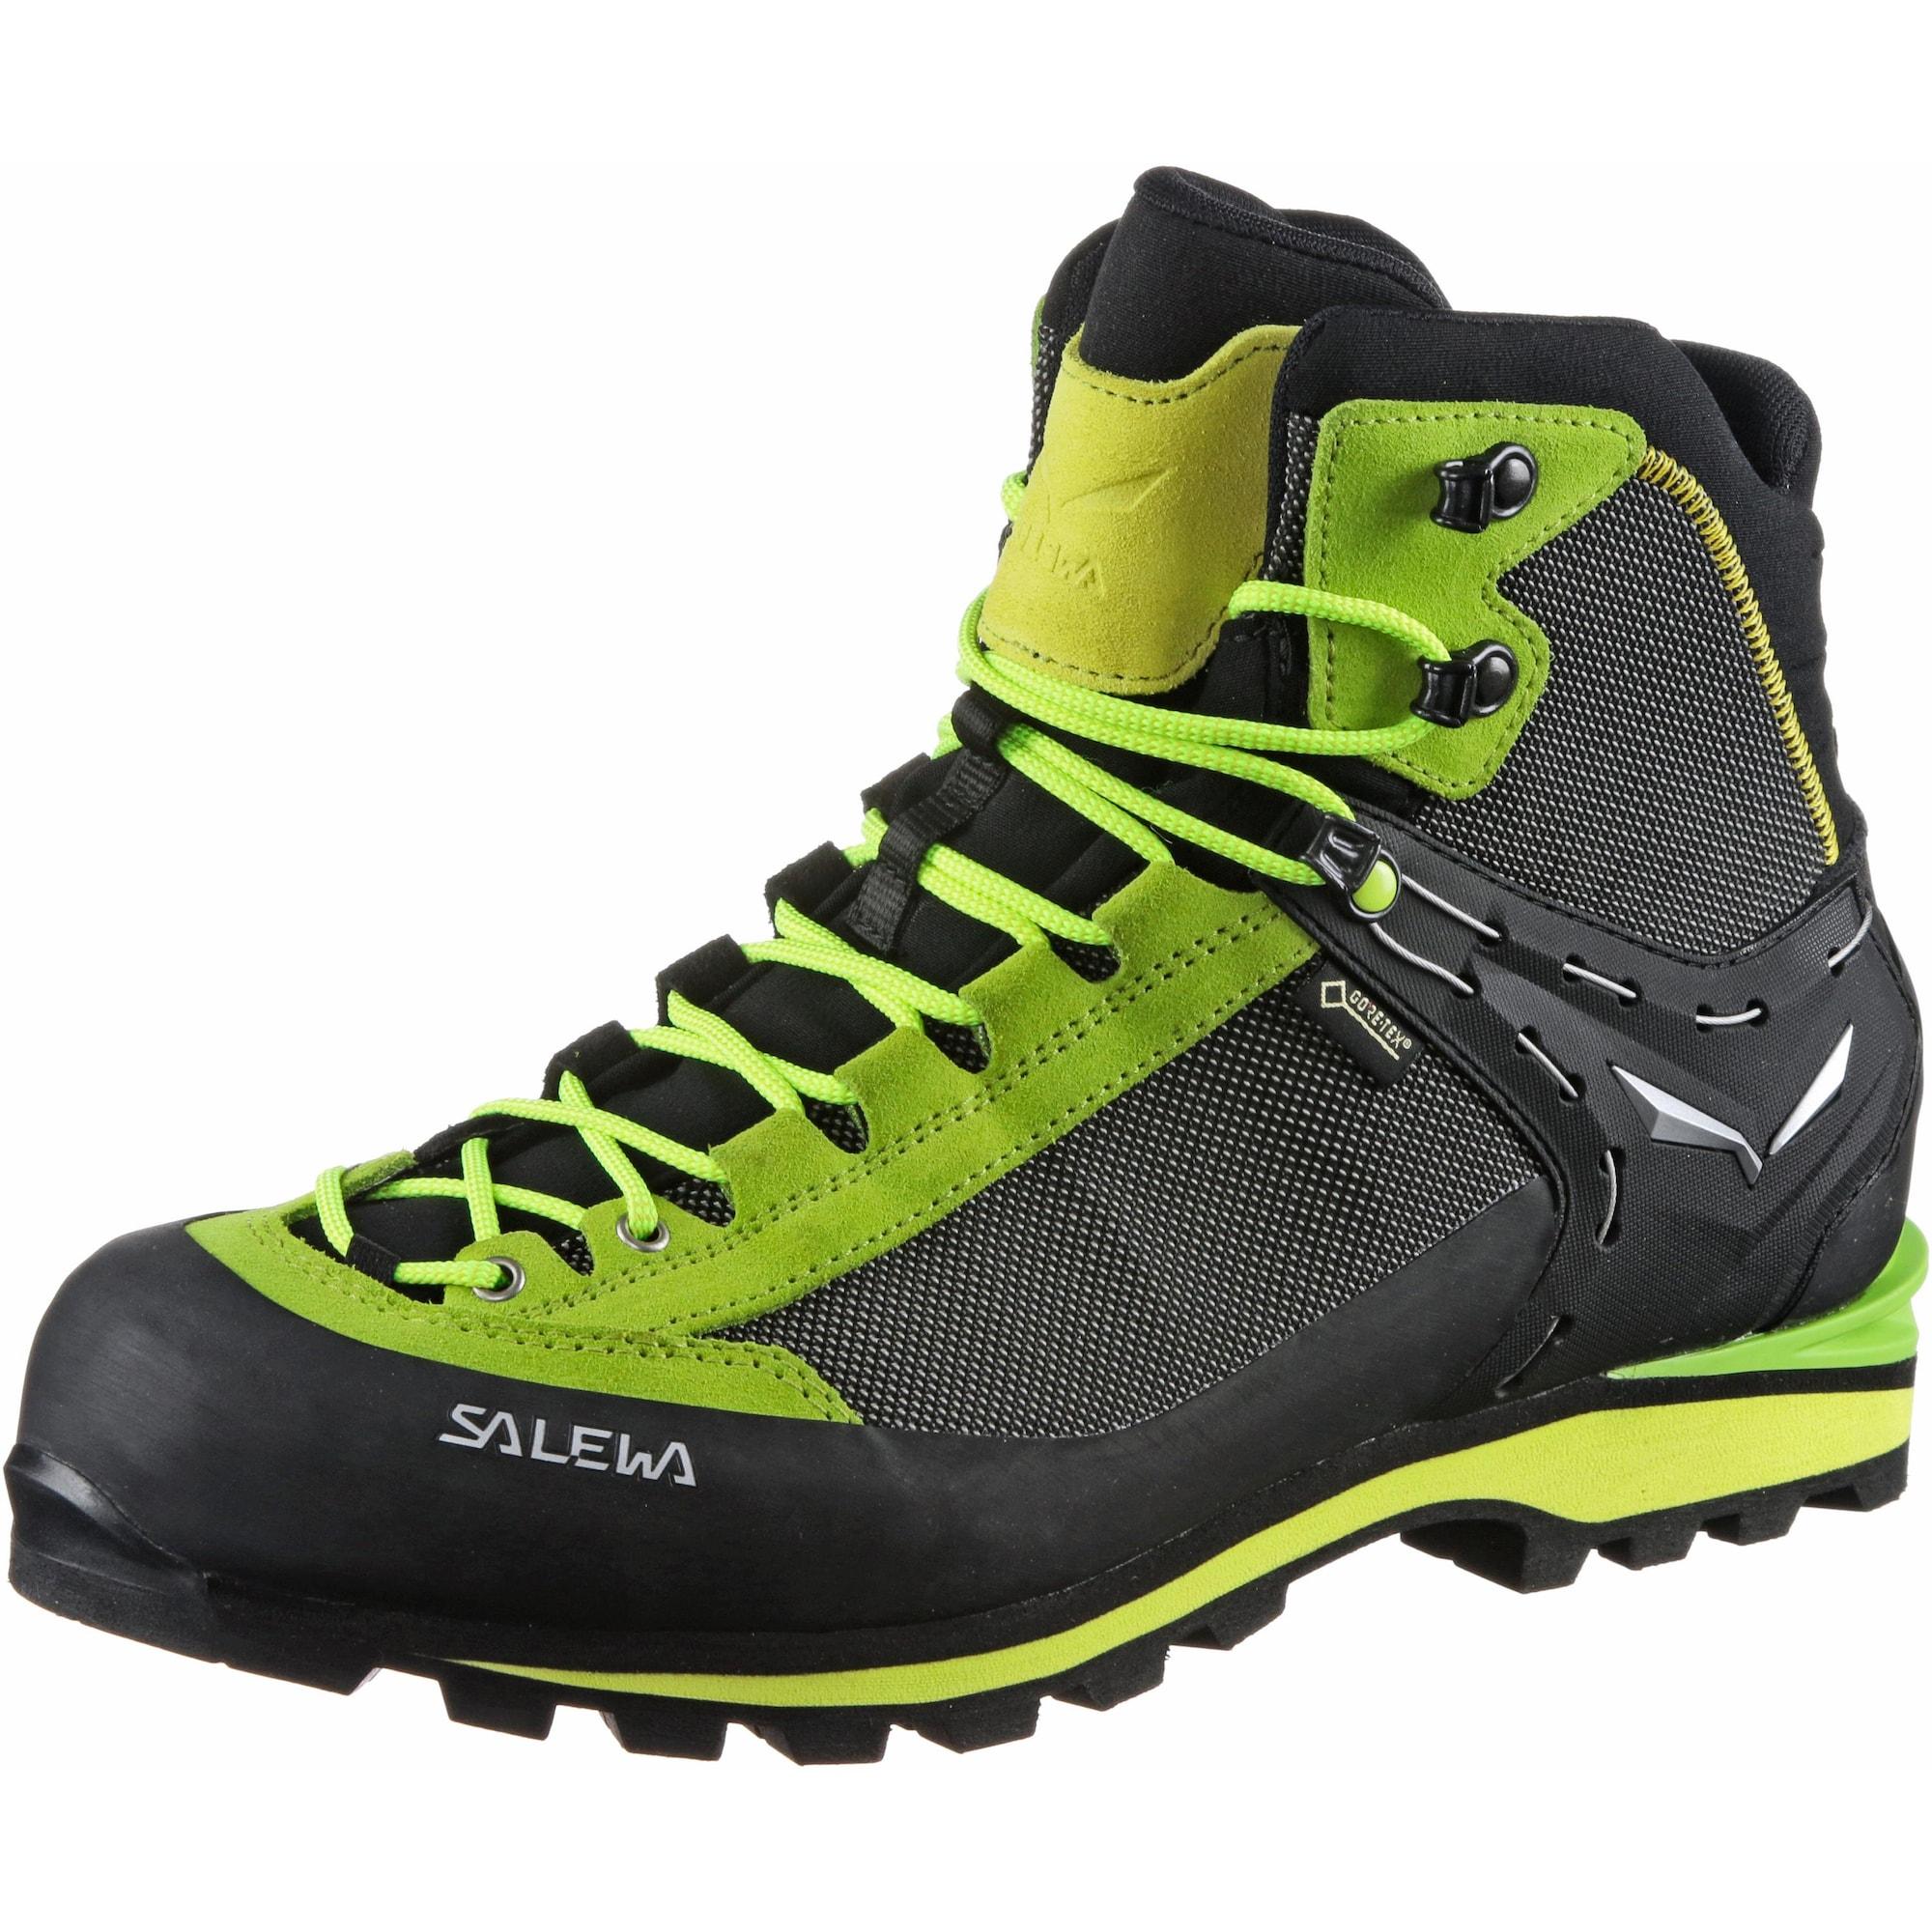 Alpine Bergschuhe 'MS CROW GTX' | Schuhe > Outdoorschuhe > Bergschuhe | Hellgrün - Schwarz | SALEWA